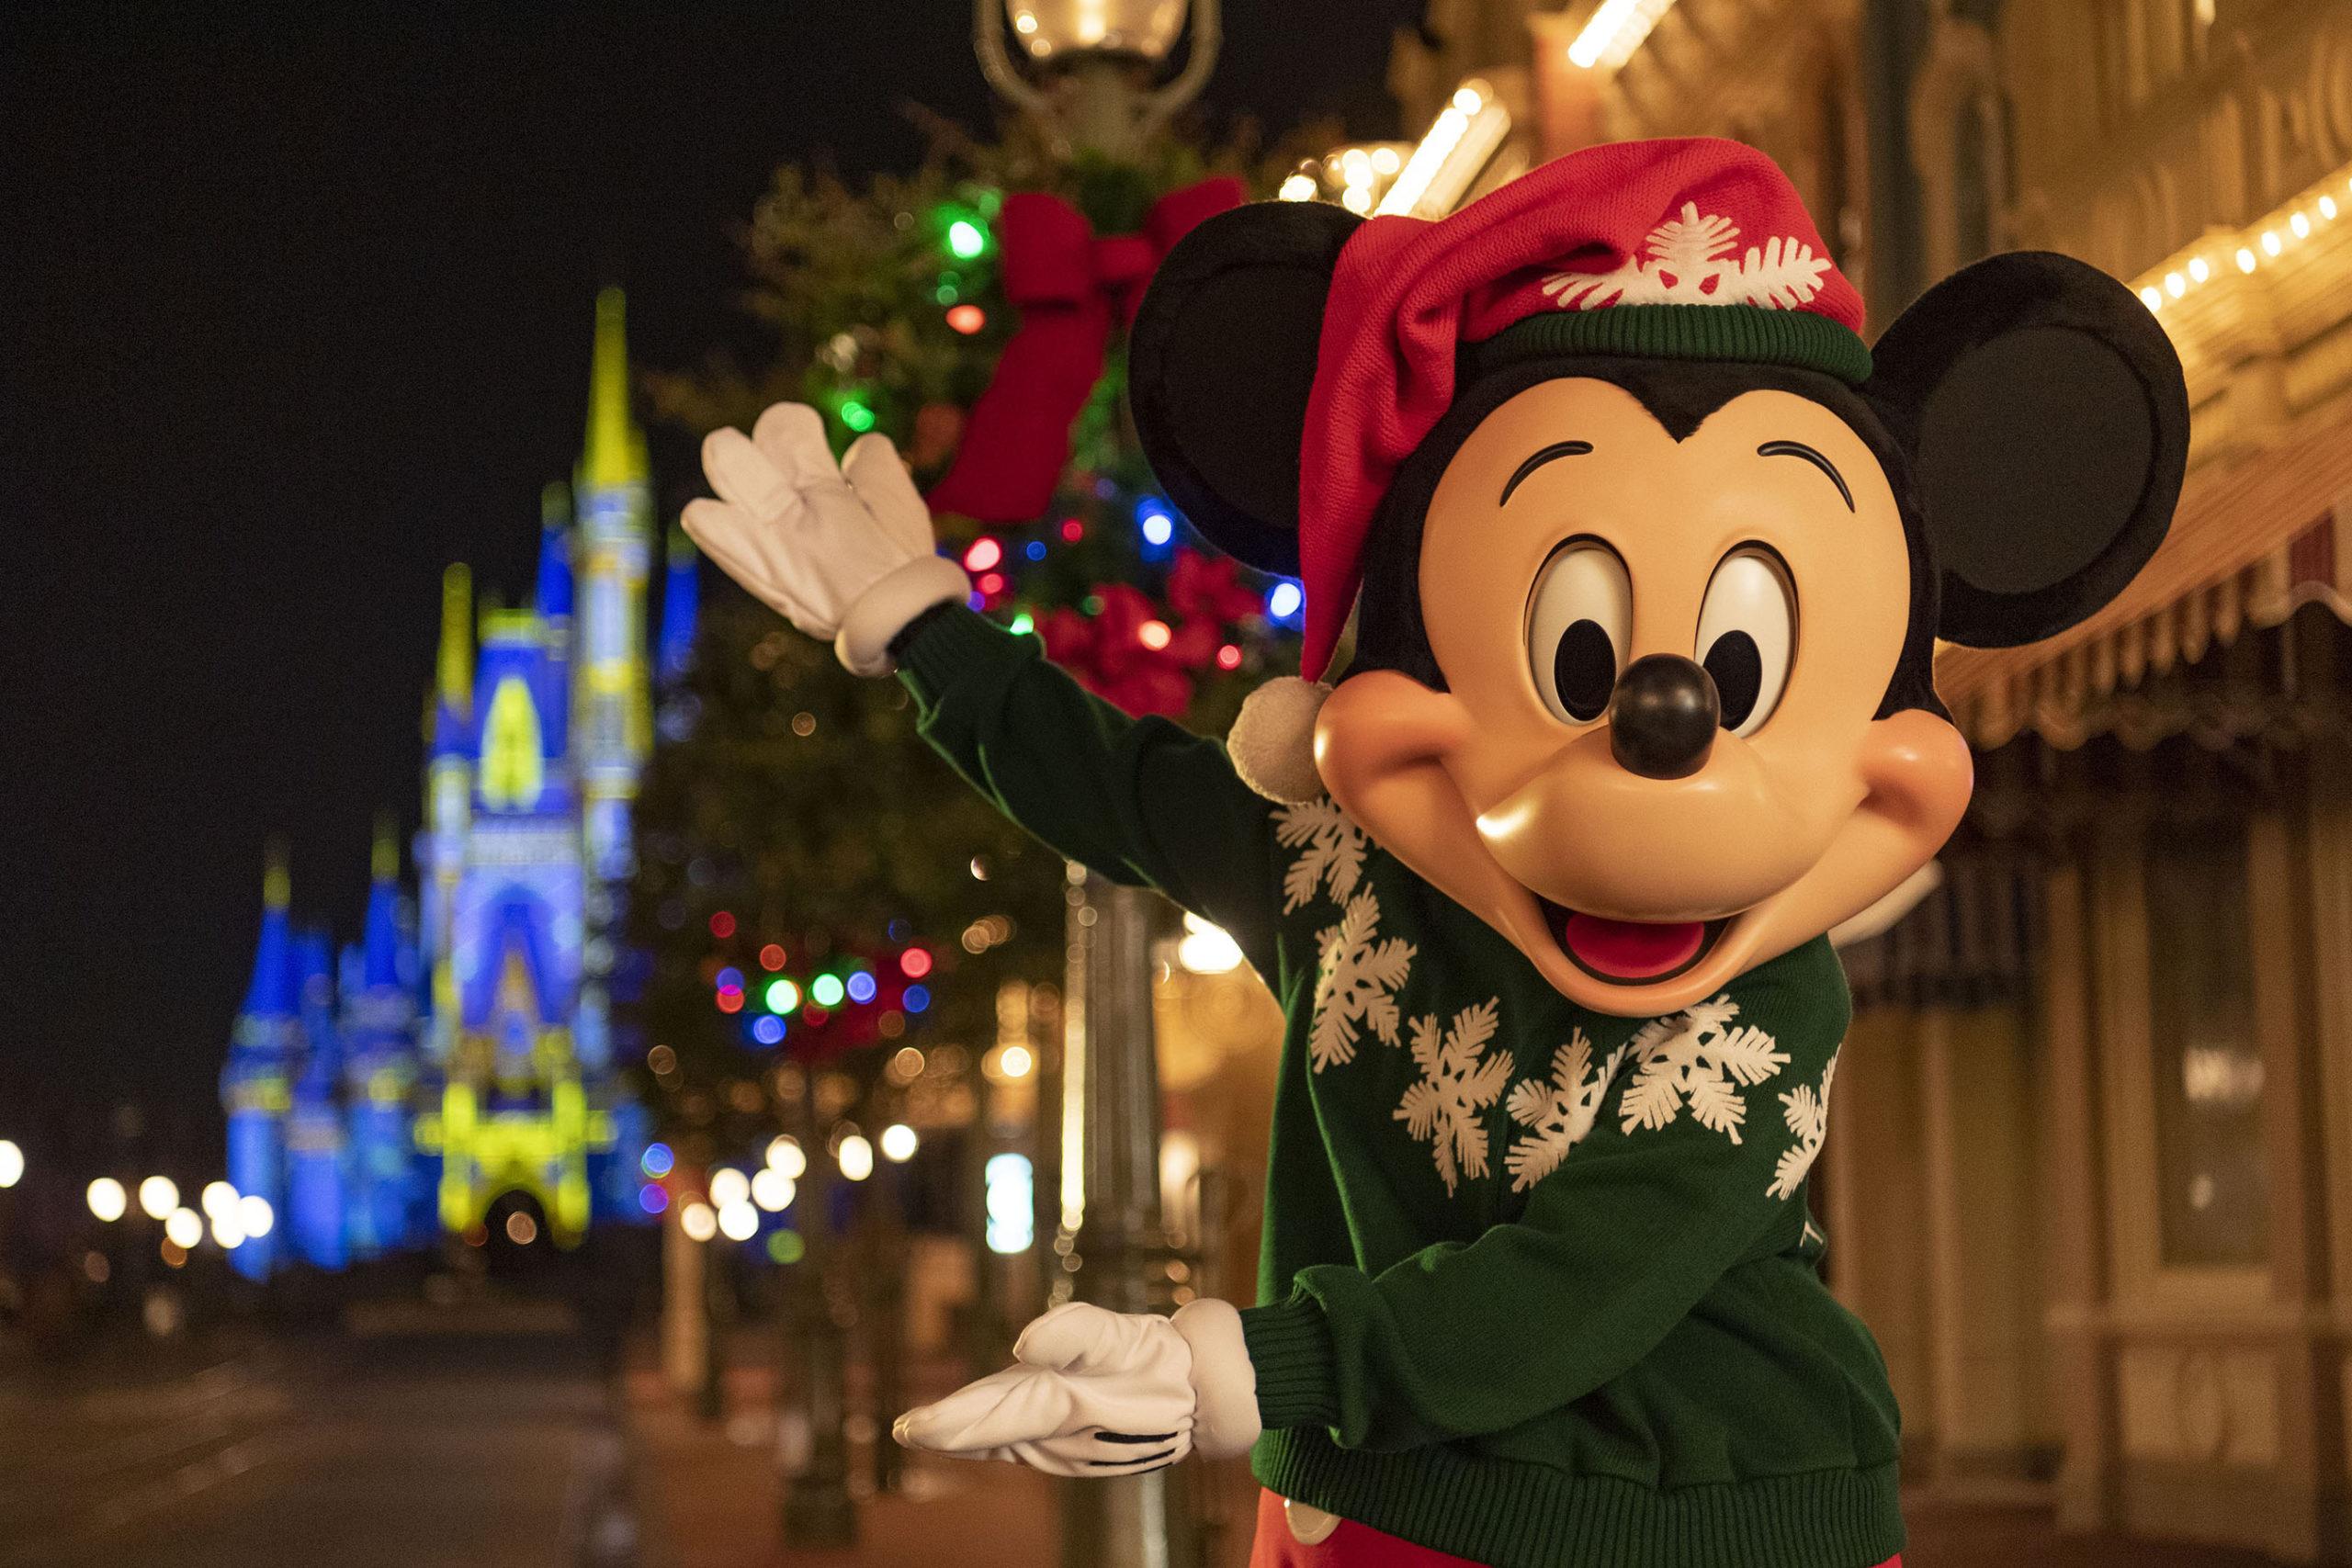 Christmas Dinner Restaurants In Tampa 2020 Deck the halls: Walt Disney World reimagines 2020 holiday celebration